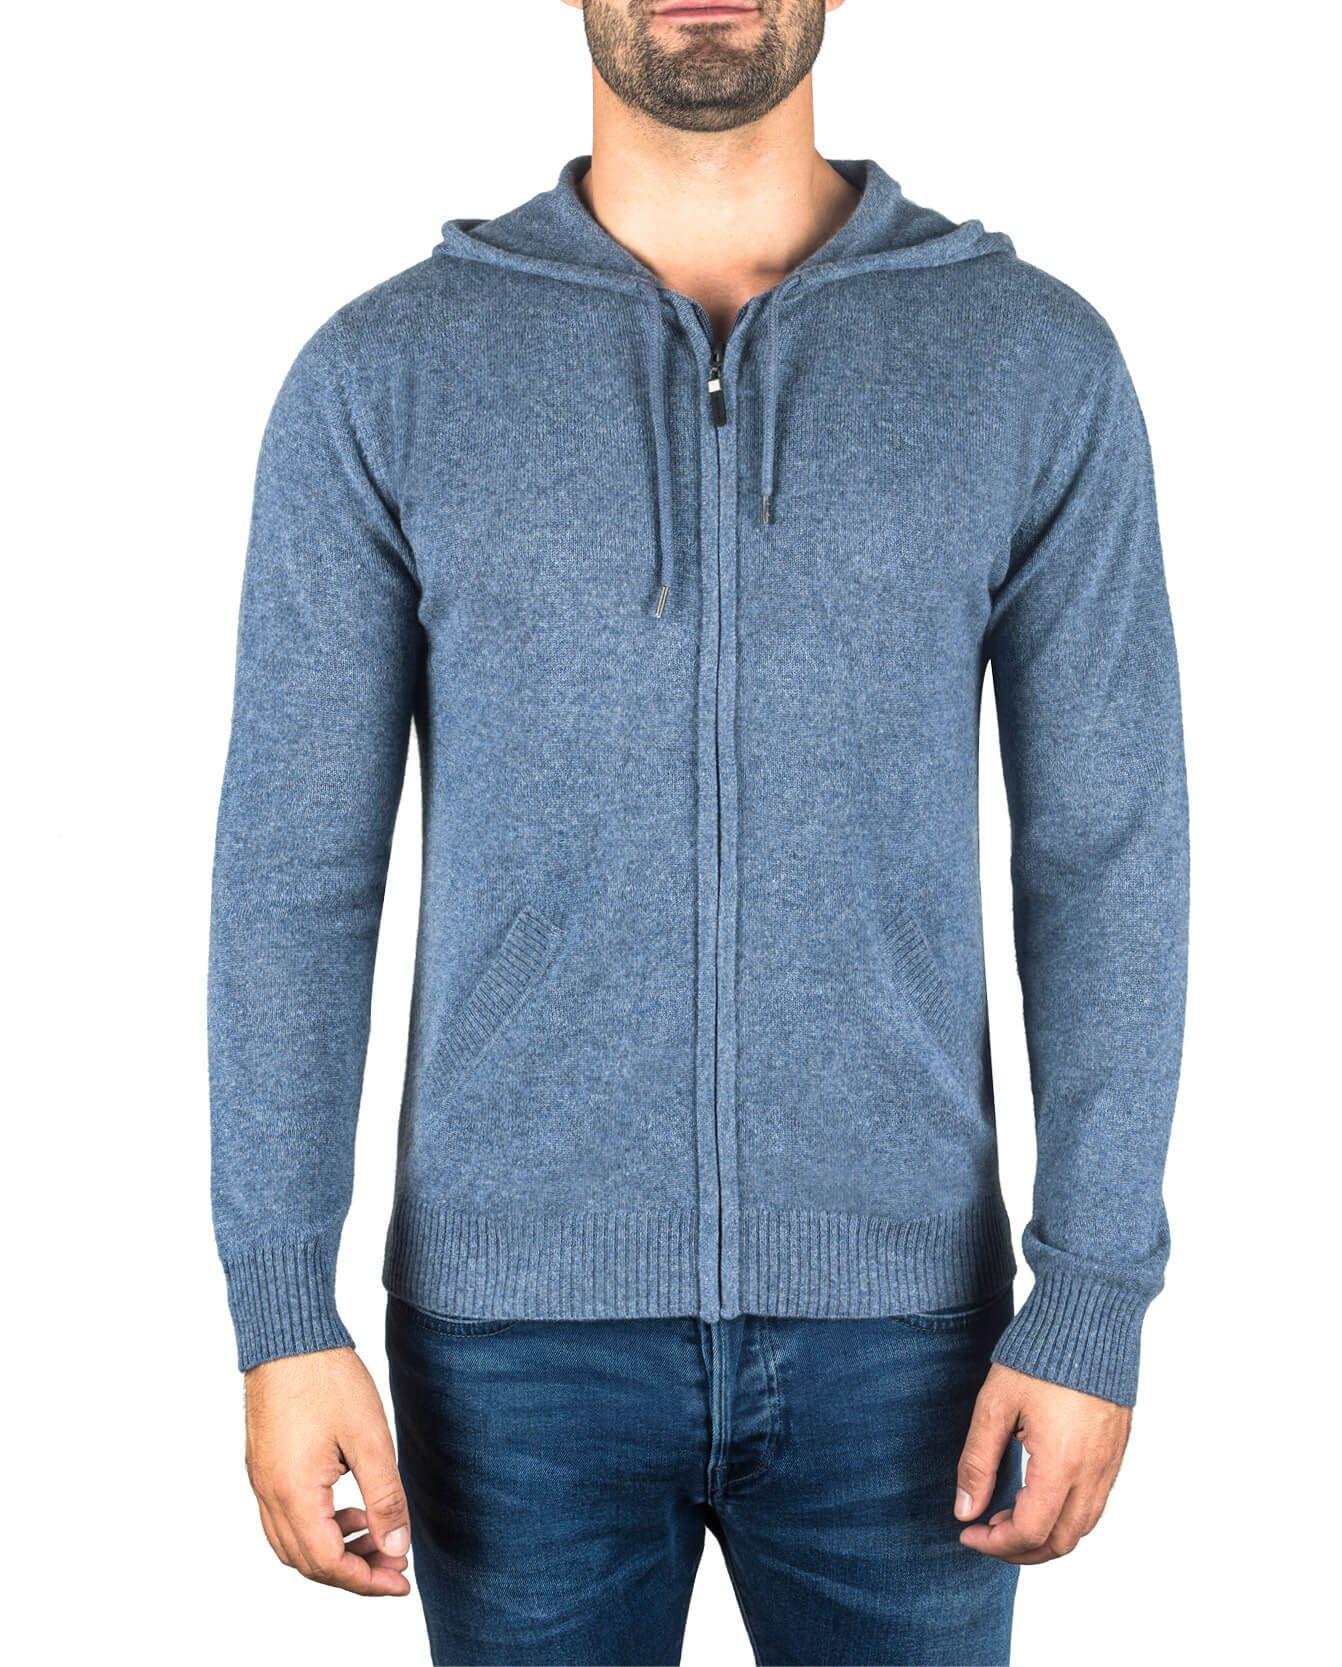 Herren Kaschmir Kapuzenpullover Hoodie jeans blau fornt